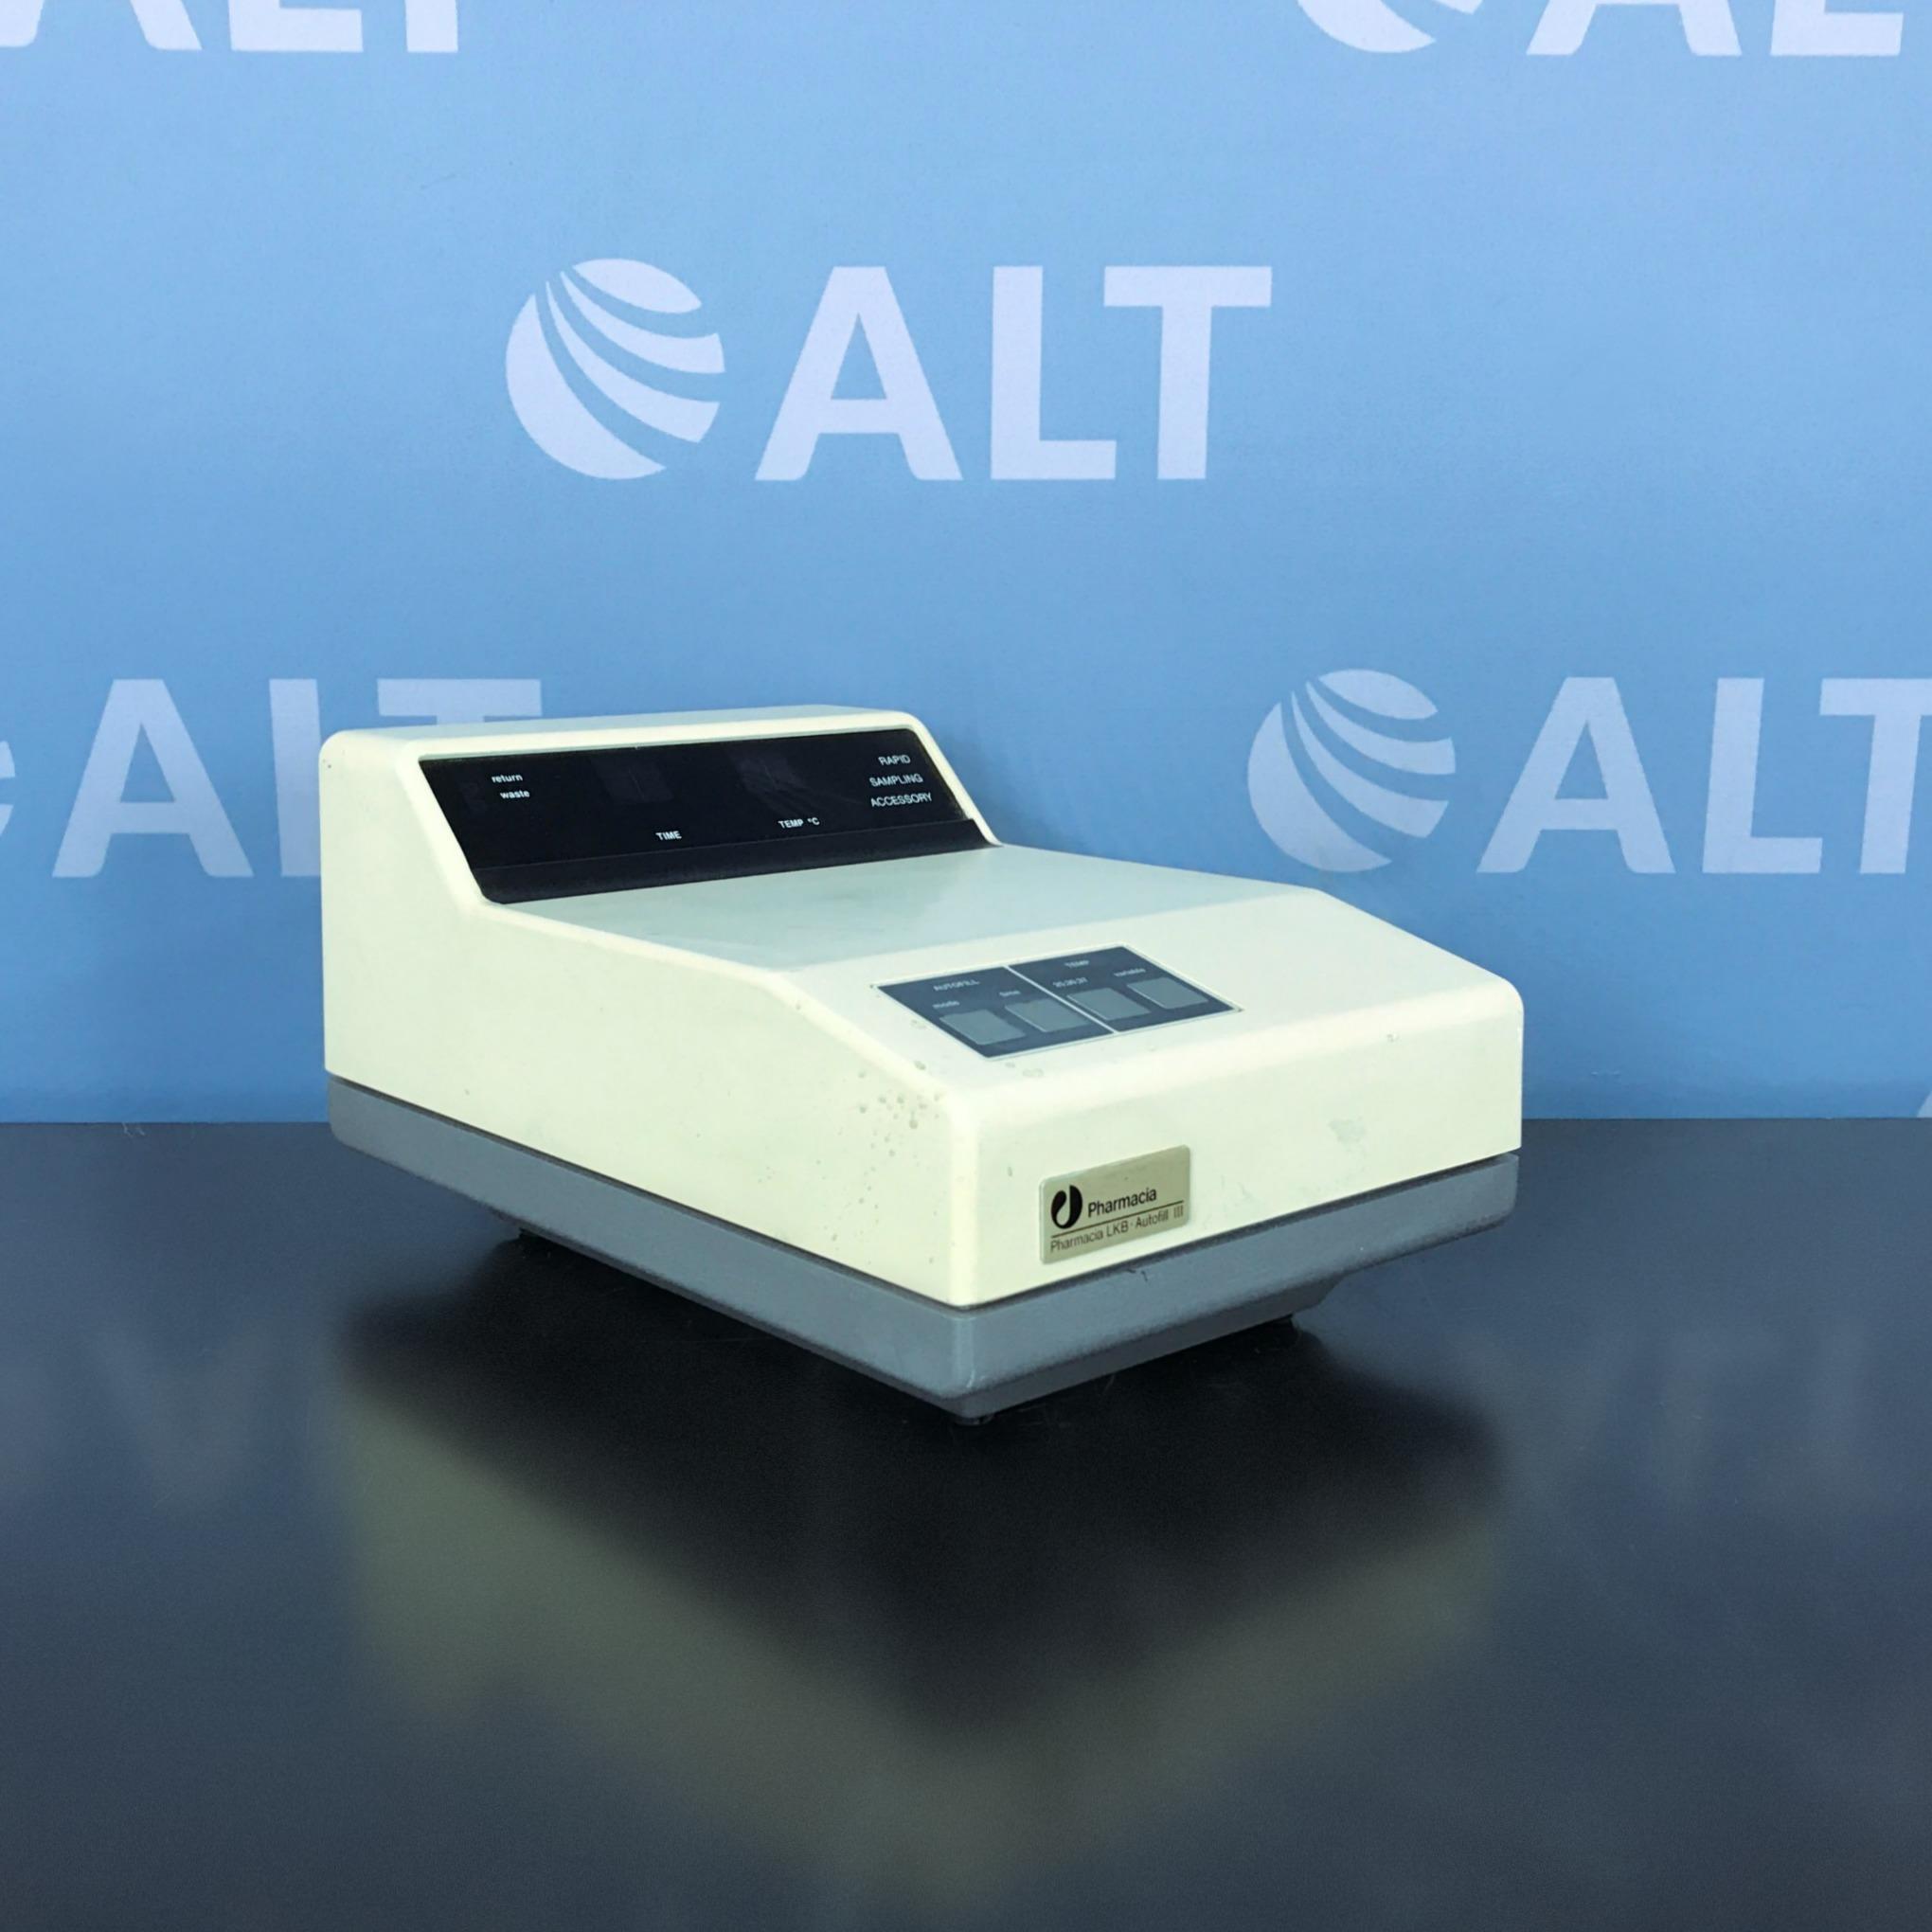 Pharmacia LKB Ultrospec III UV/Vis Spectrophotometer with  Autofill III Image